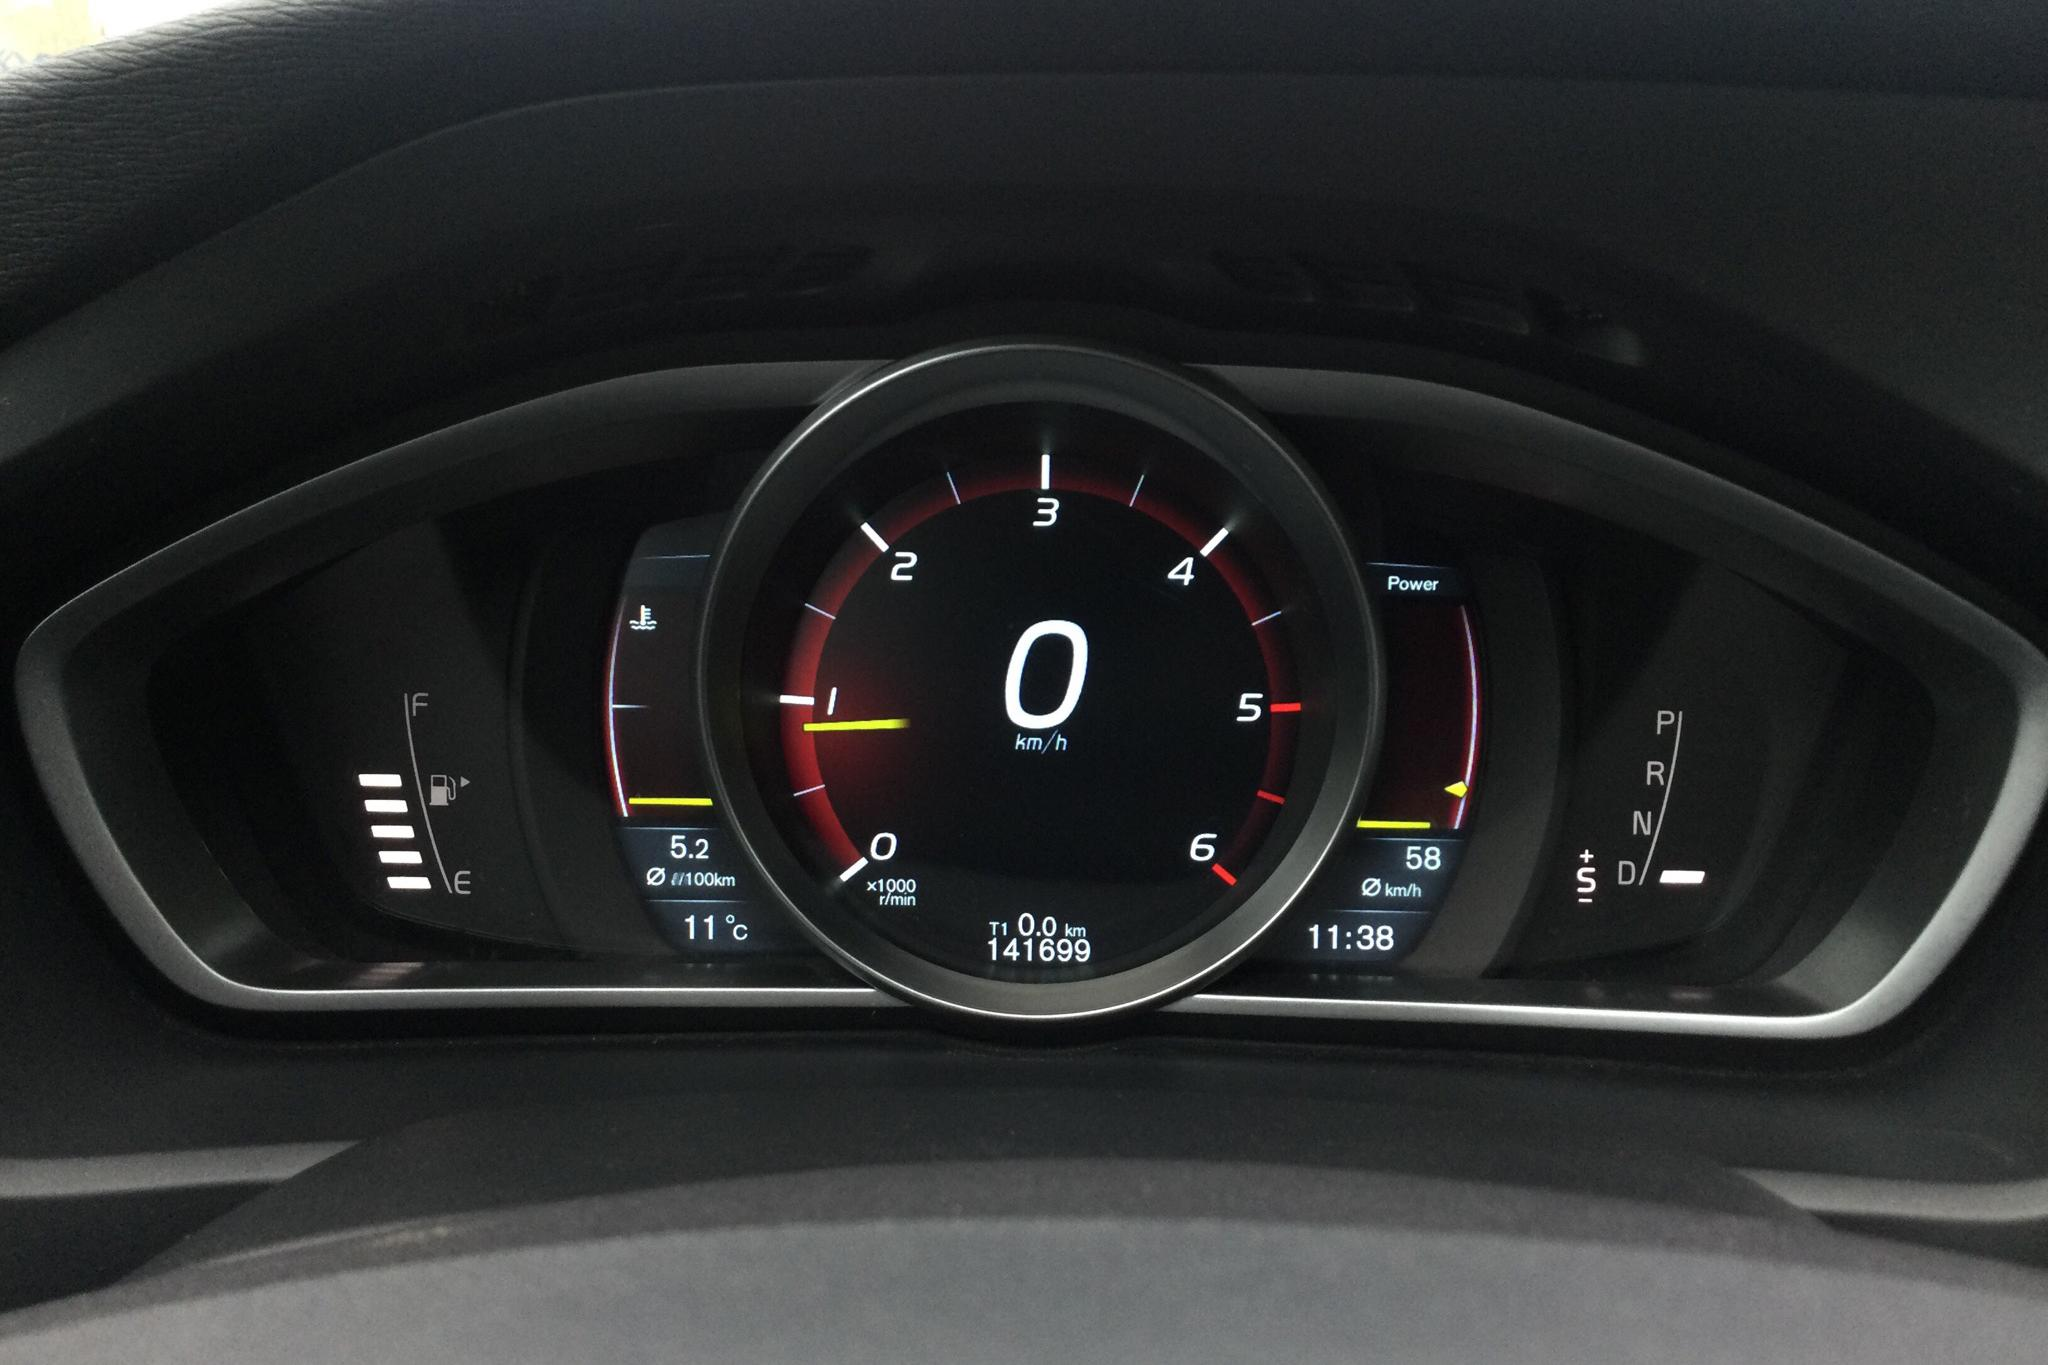 Volvo V40 D2 (115hk) - 141 690 km - Automatic - red - 2014